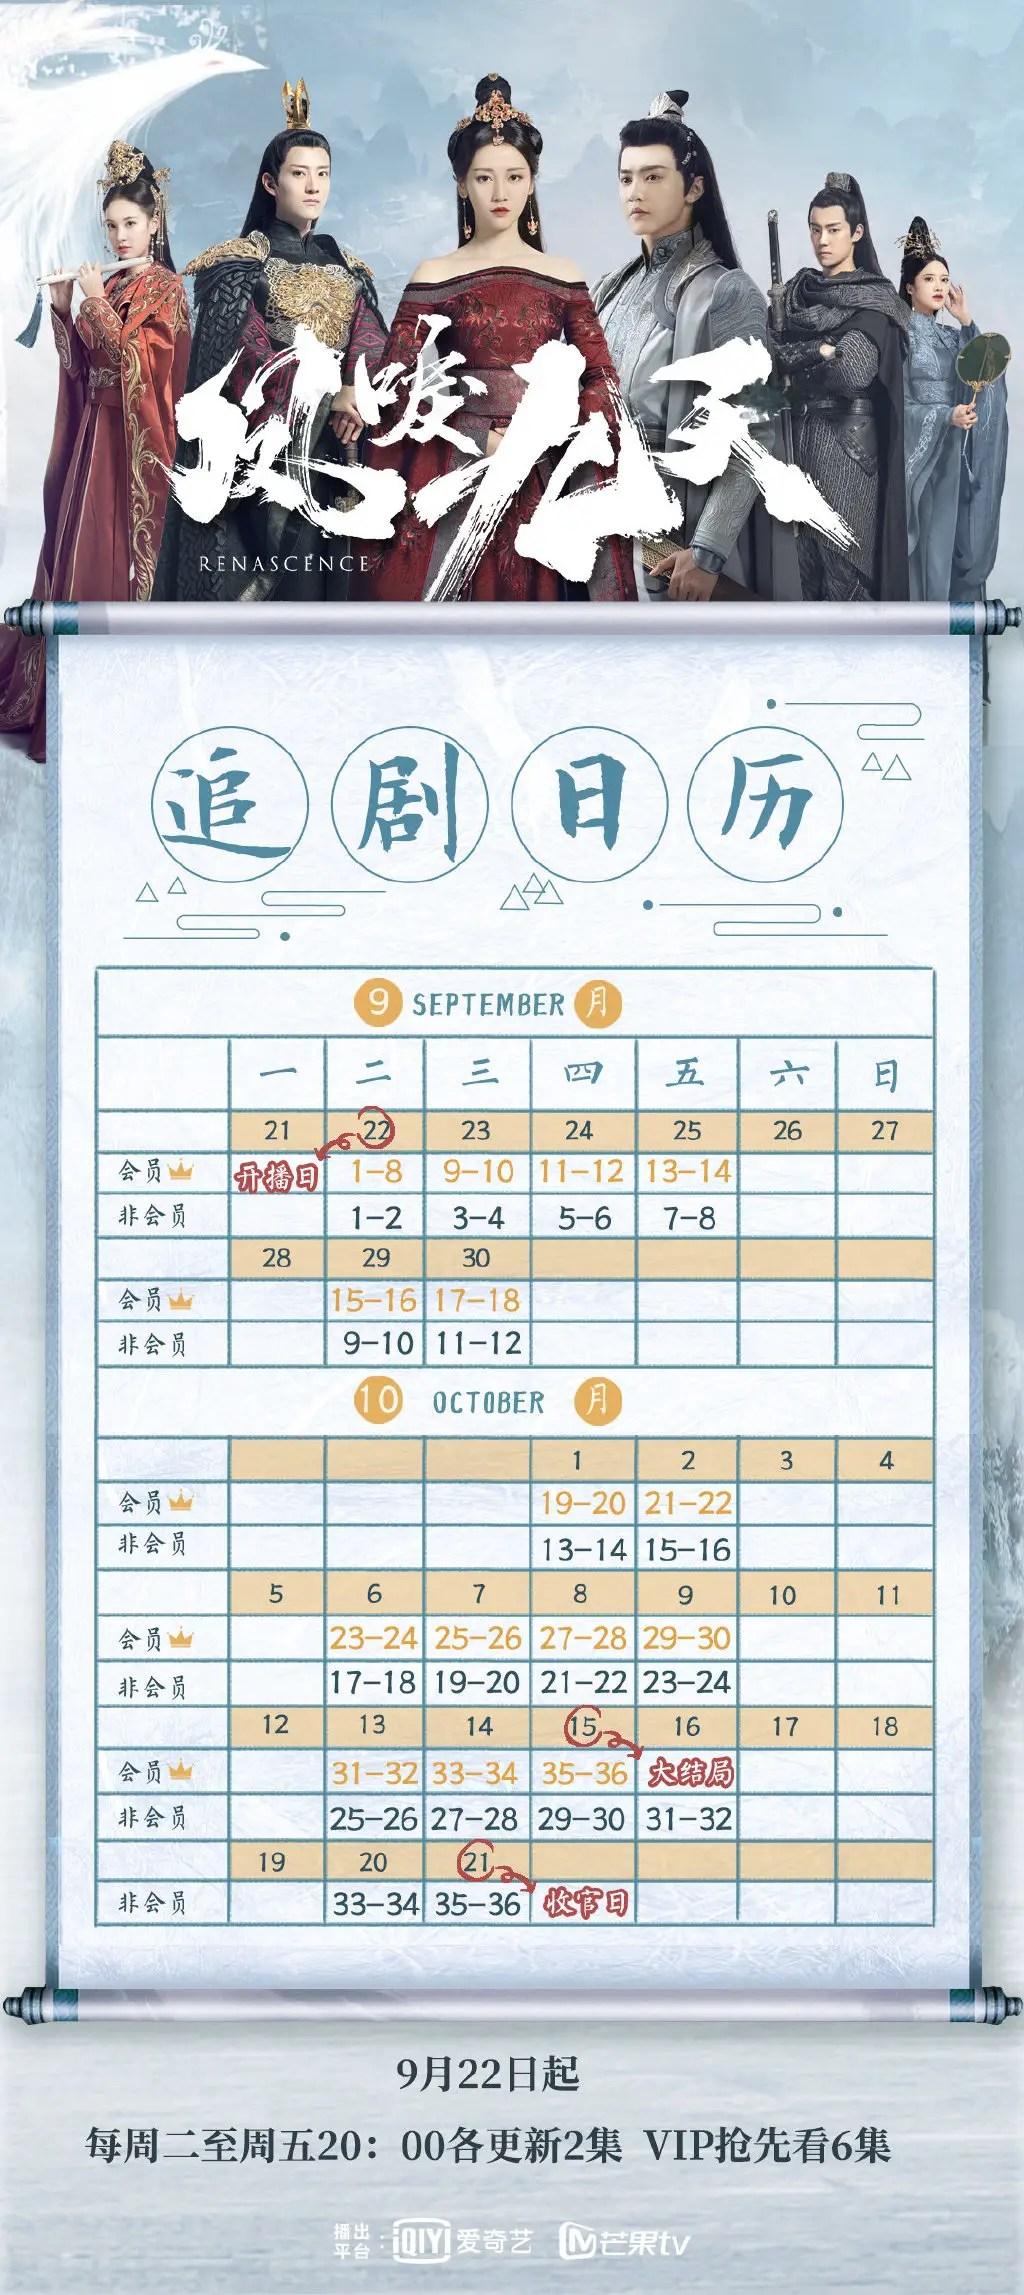 Renascence Chinese Drama Airing Calendar